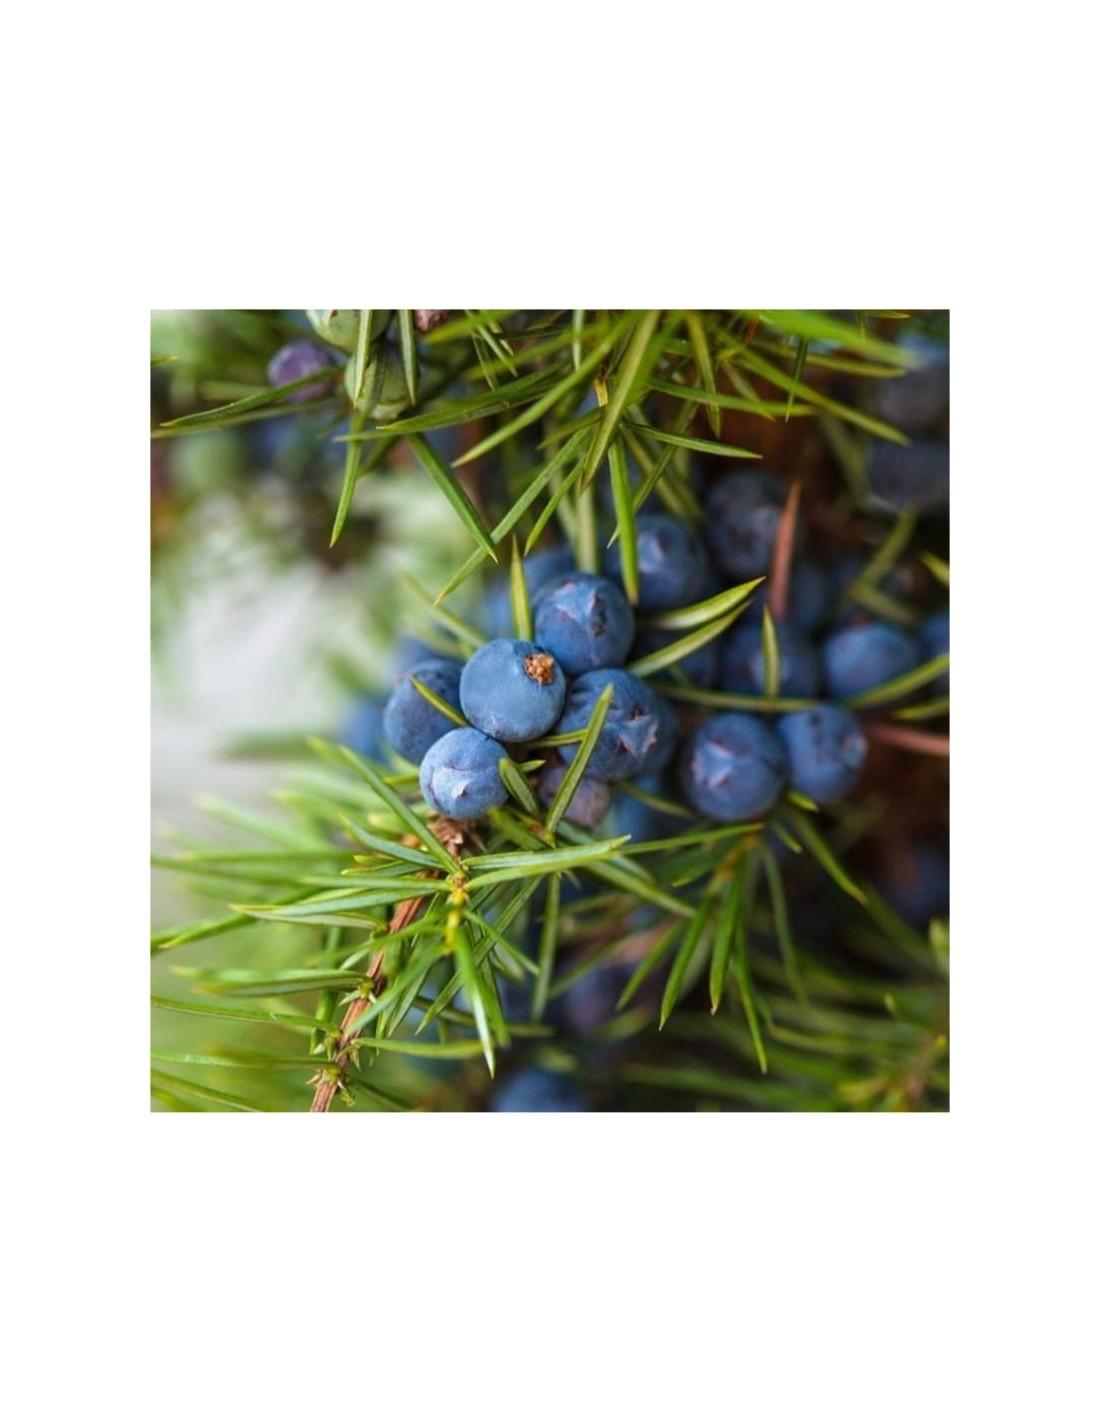 637216023496013612-pianta-ginepro-oxycedrus-vaso-7cm